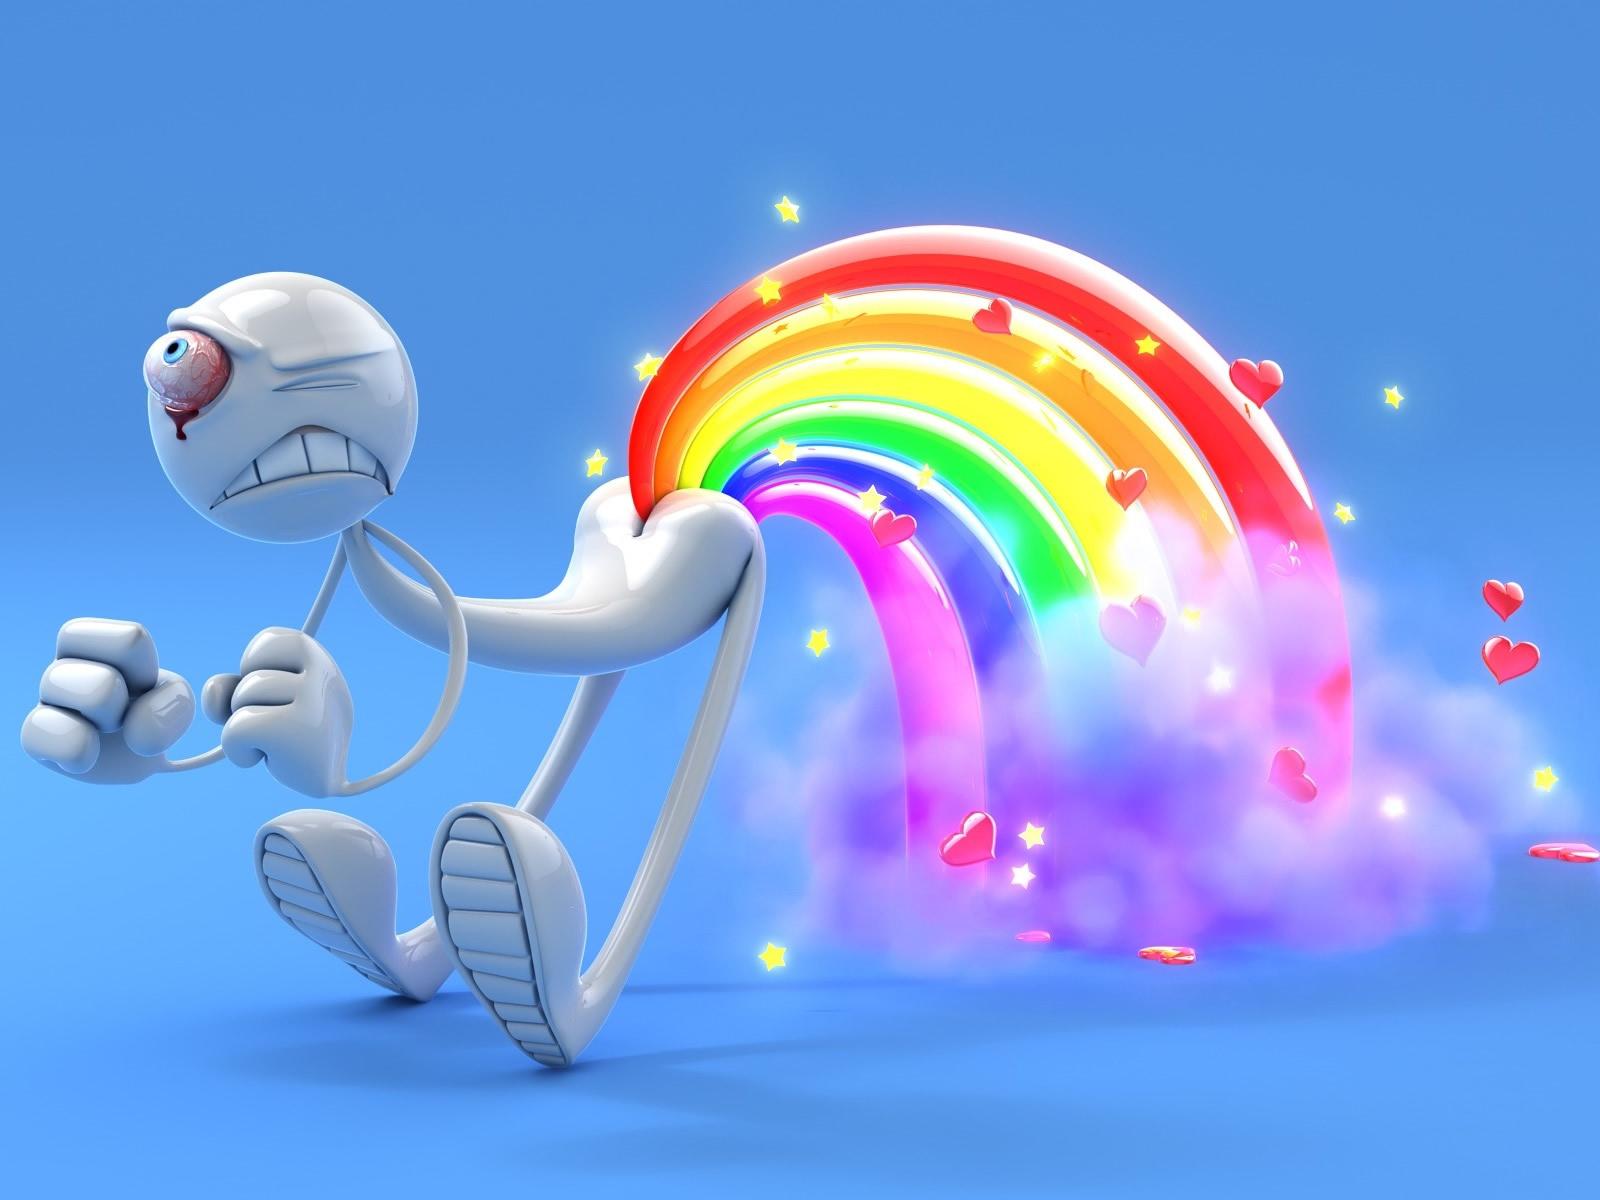 http://1.bp.blogspot.com/-CNHpgVIxFGY/UERRl4khsBI/AAAAAAAAB70/B54F8S9wUDA/s1600/color-3D-Wallpapers.jpg